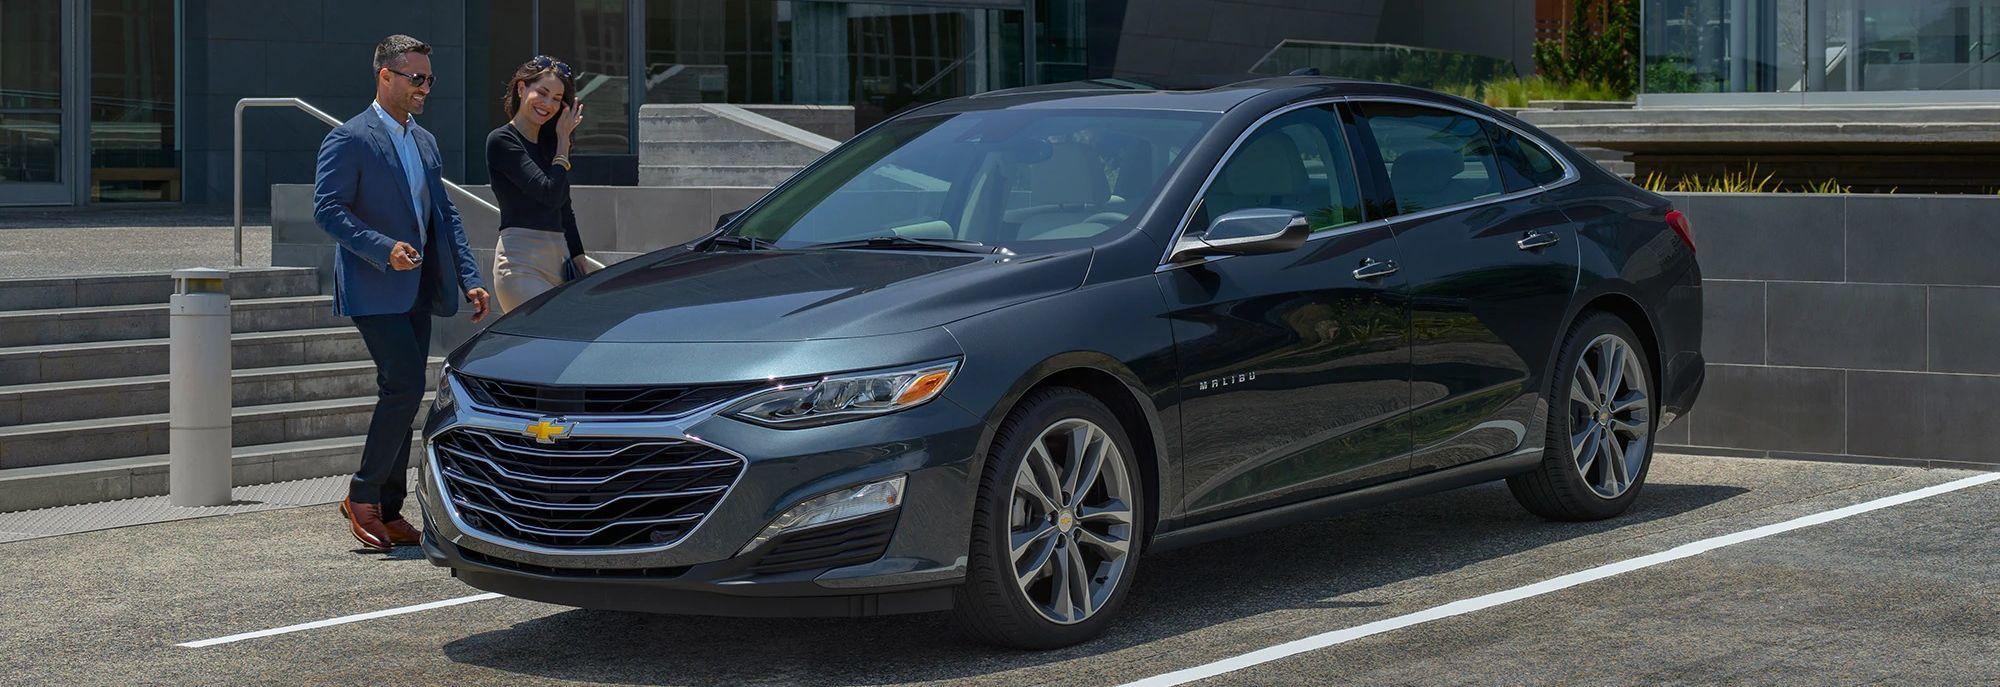 2019 Chevrolet Malibu Financing near Lansing, MI